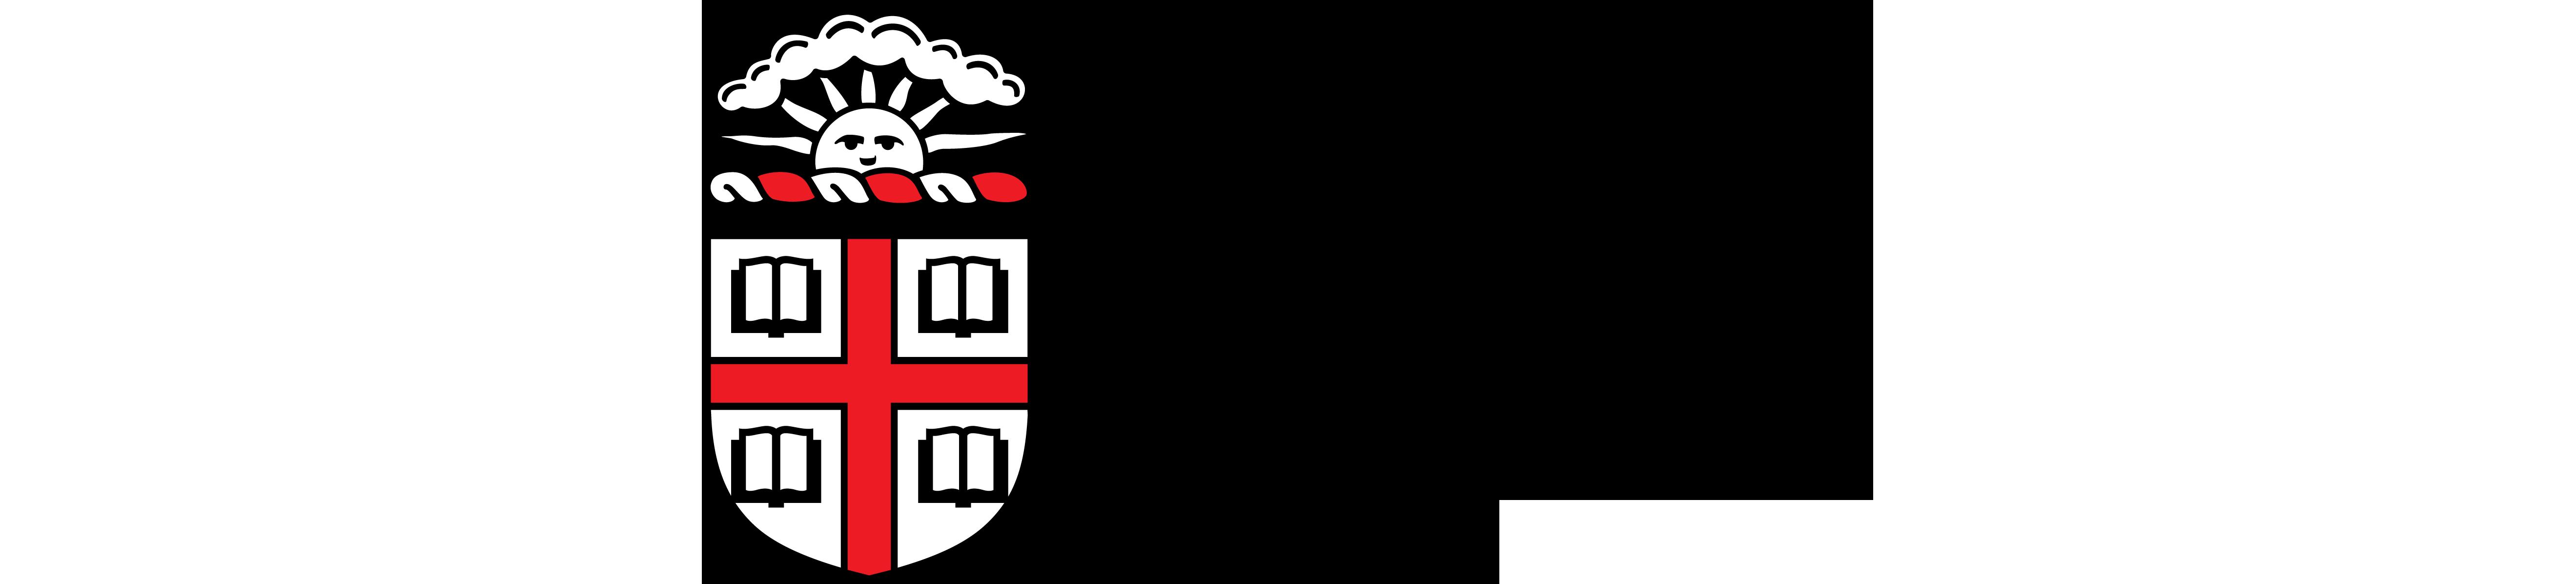 Brown University crest.